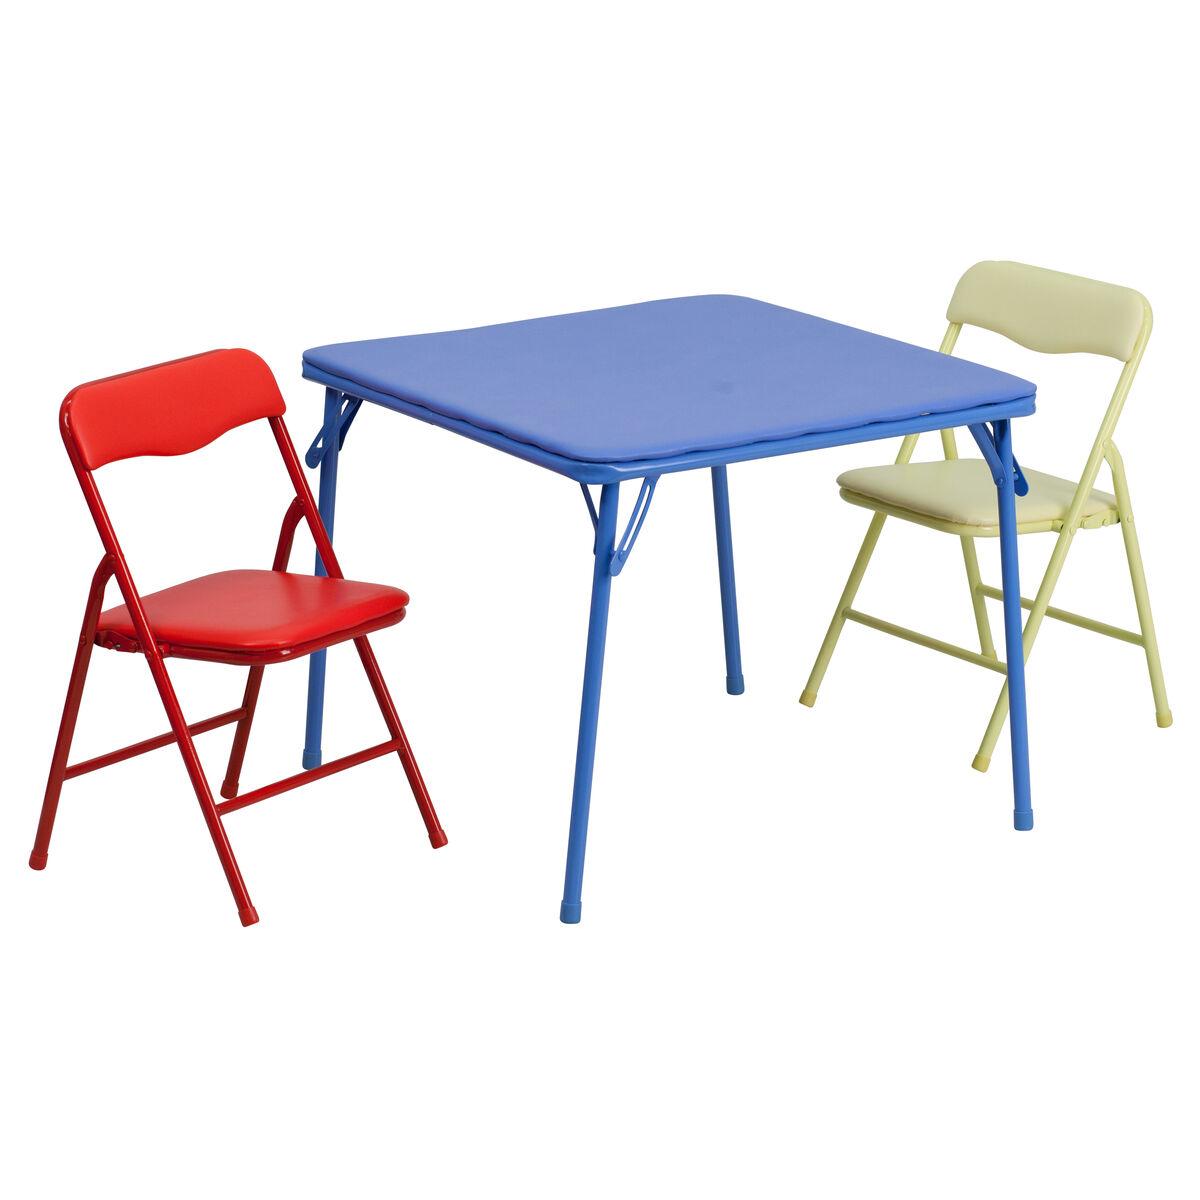 3 Piece Kids Folding Table Set Jb 10 Card Gg Schoolfurniture4less Com